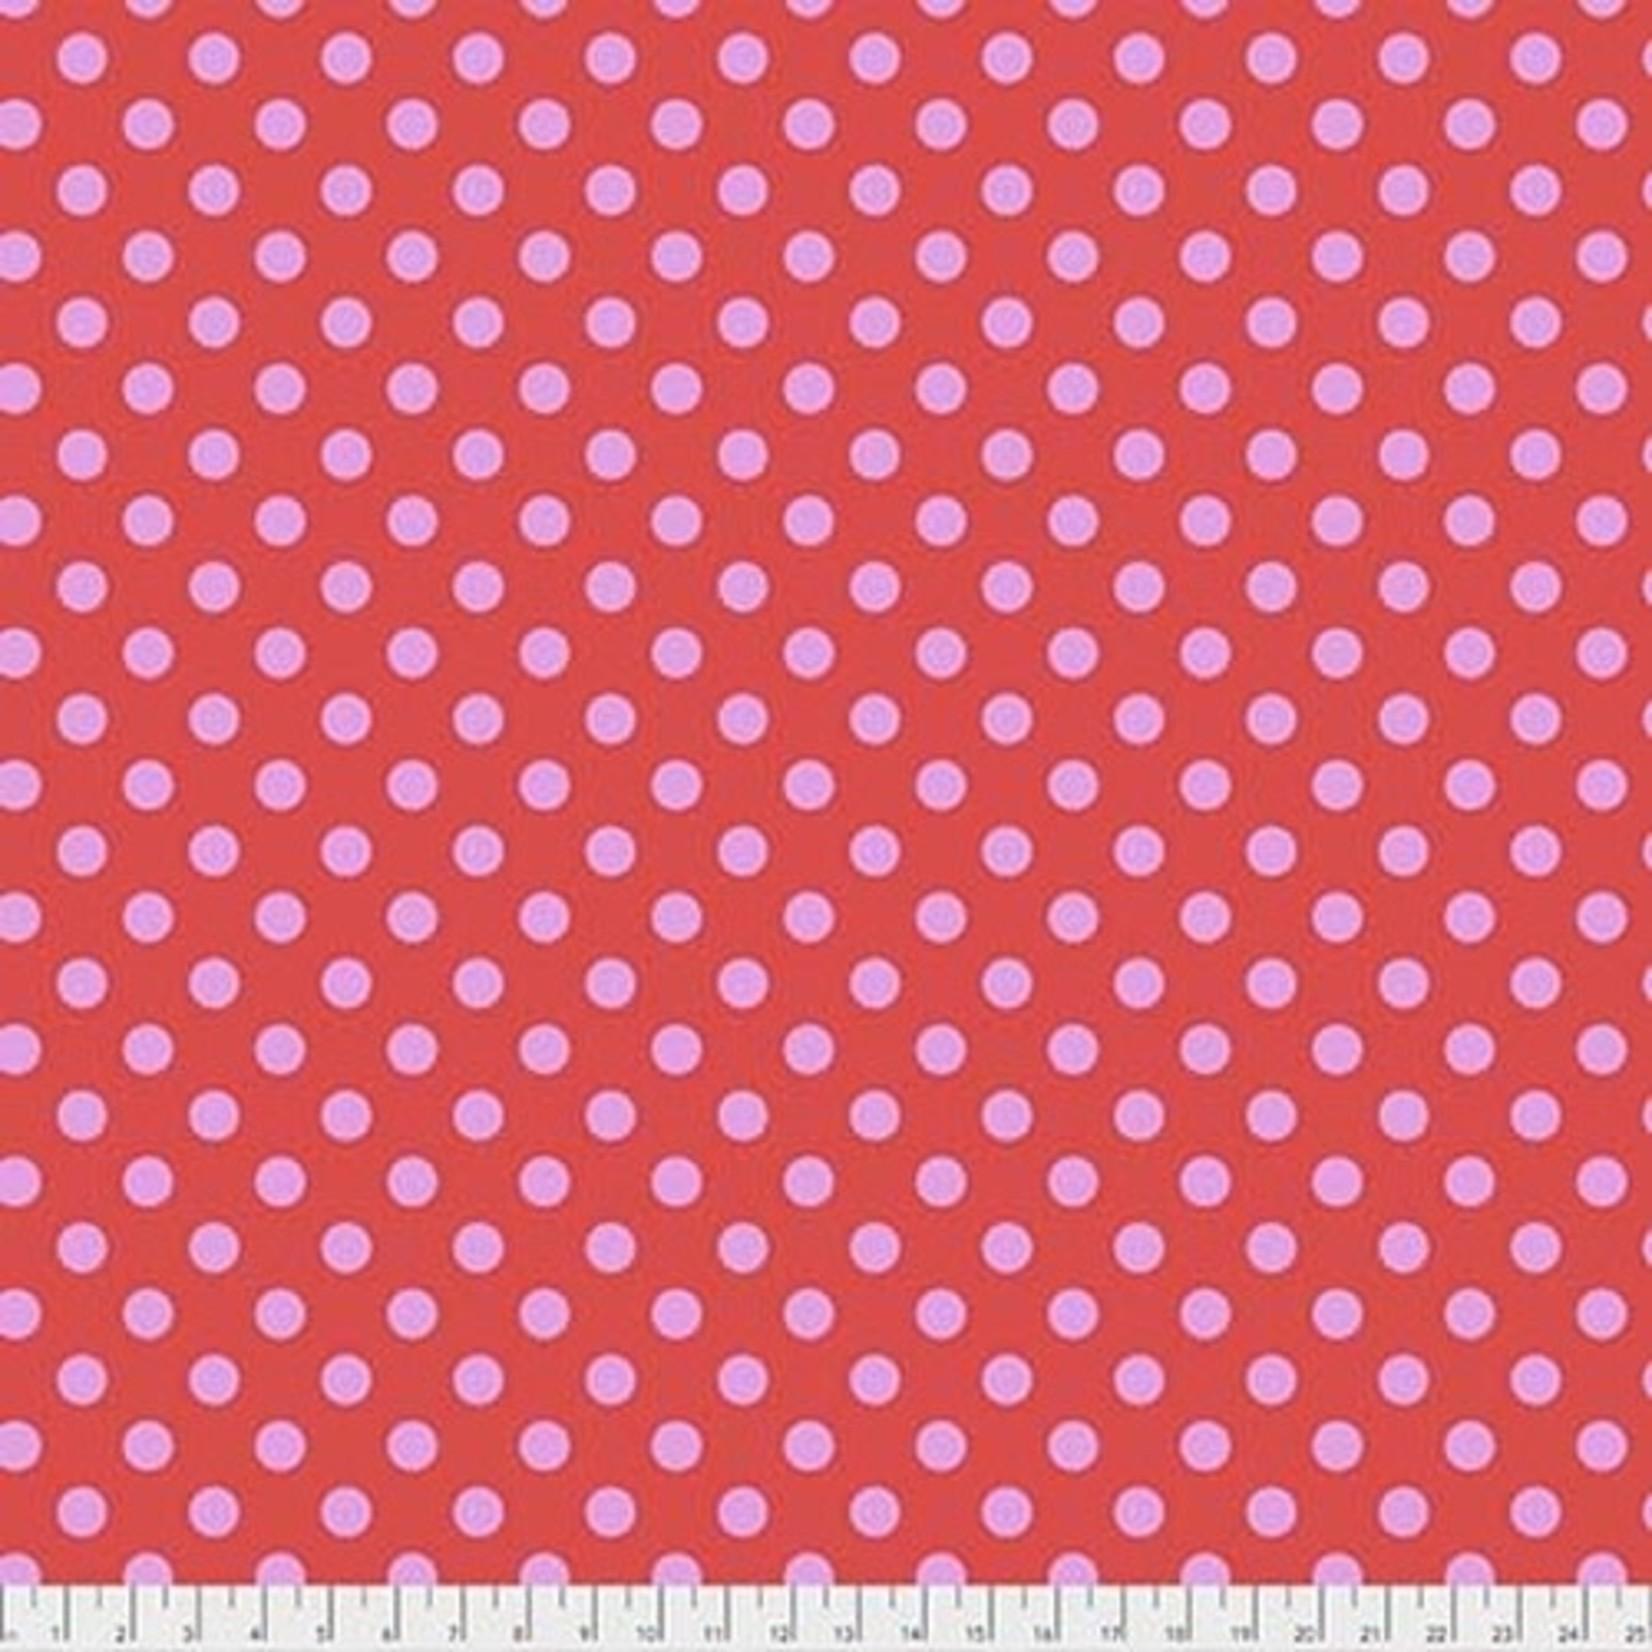 Tula Pink Tula Pom Poms- Poppy 0.17 per cm or $17/m